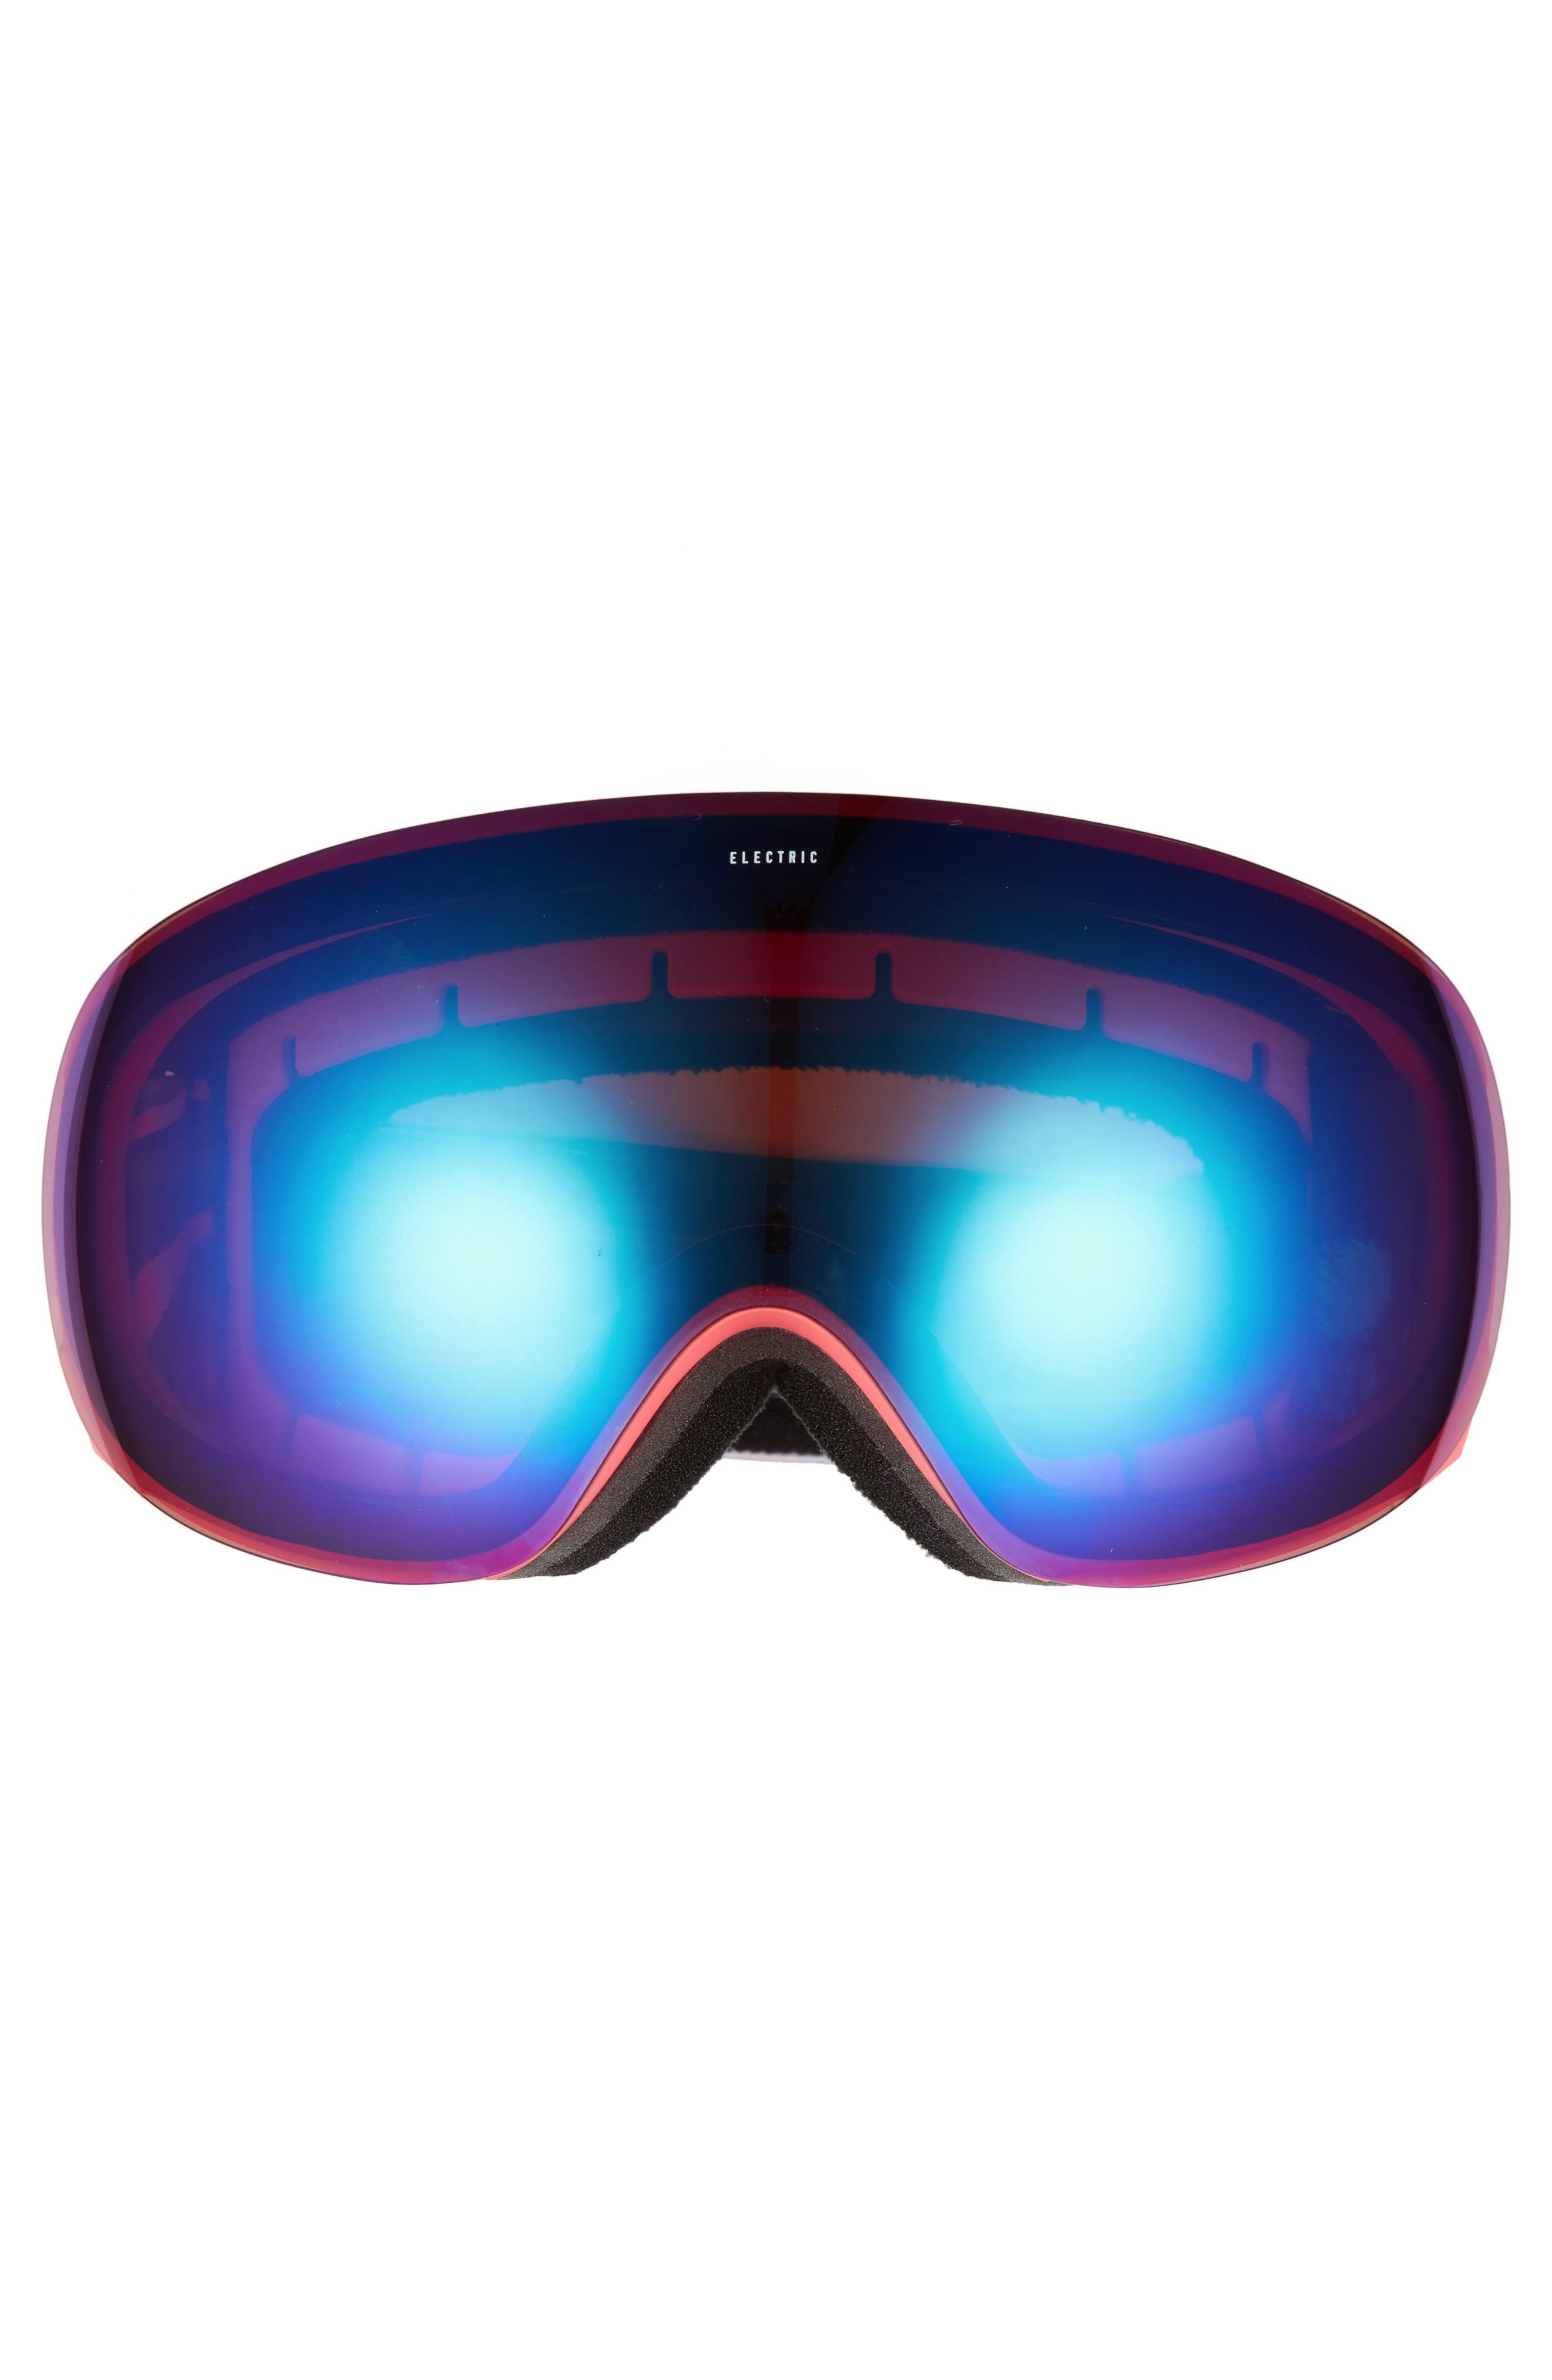 EG3.5 Snow Goggles,                             Alternate thumbnail 6, color,